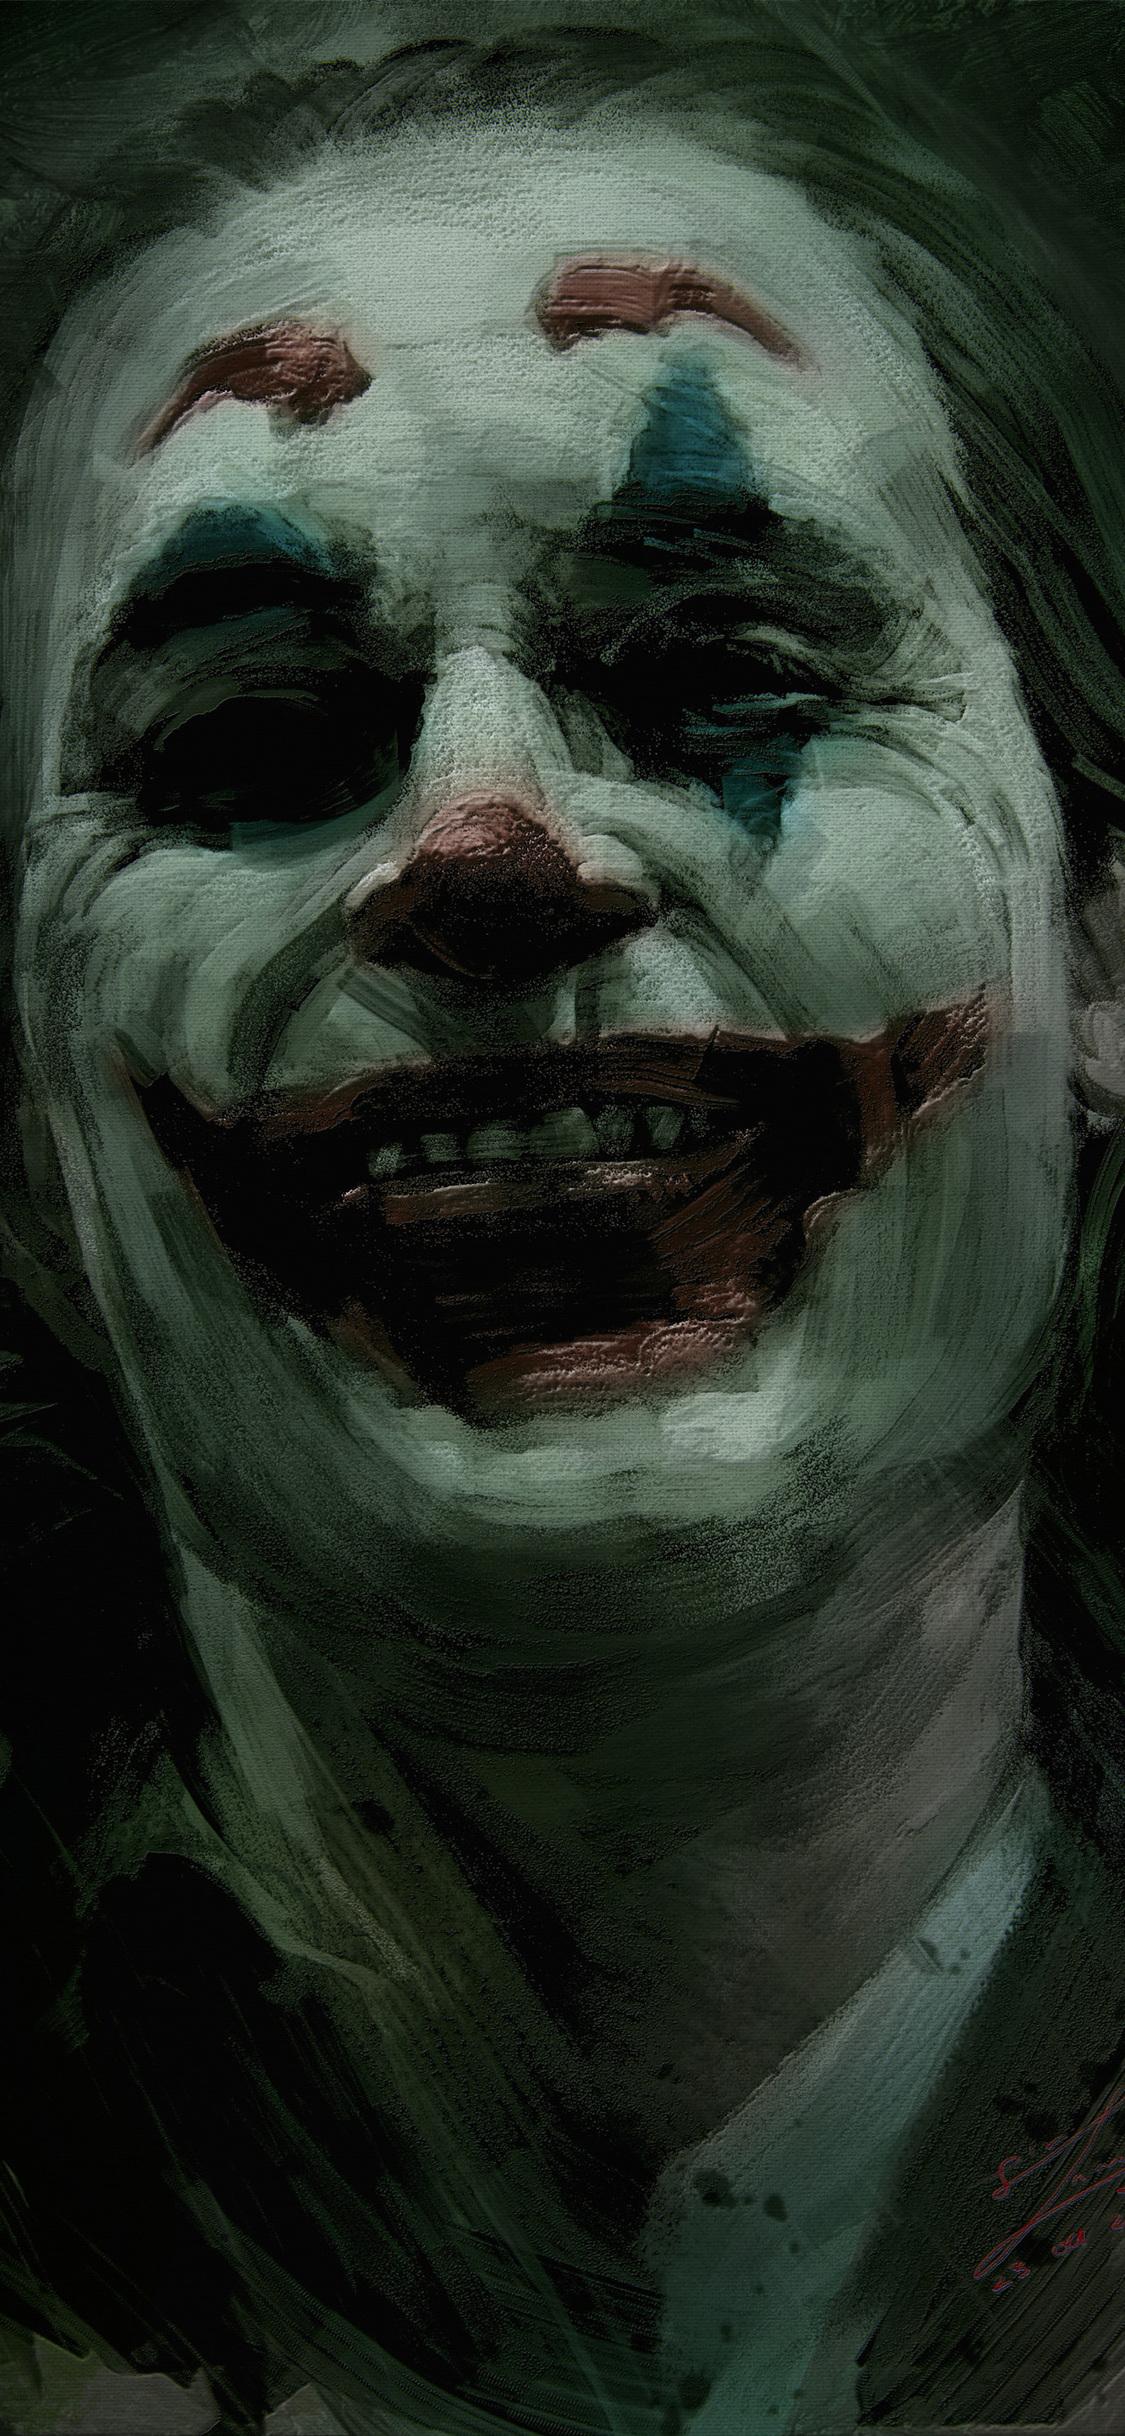 1125x2436 The Joker Joaquin Phoenix 2019 Iphone XS,Iphone ...